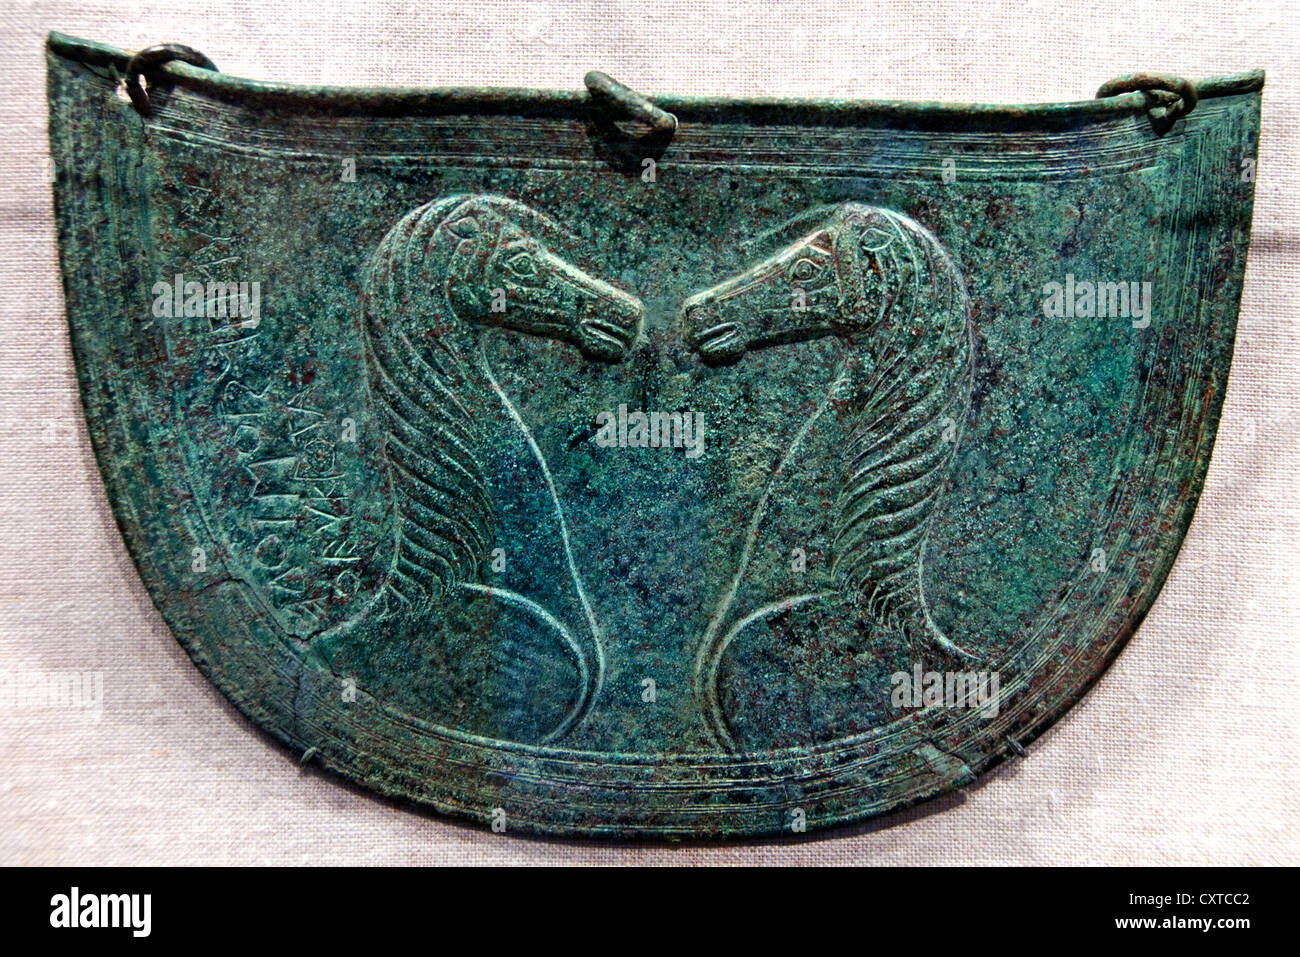 Bronze mitrai belly guards for horses 7th century B.C 7 Crete Cretan  Greek Greece - Stock Image